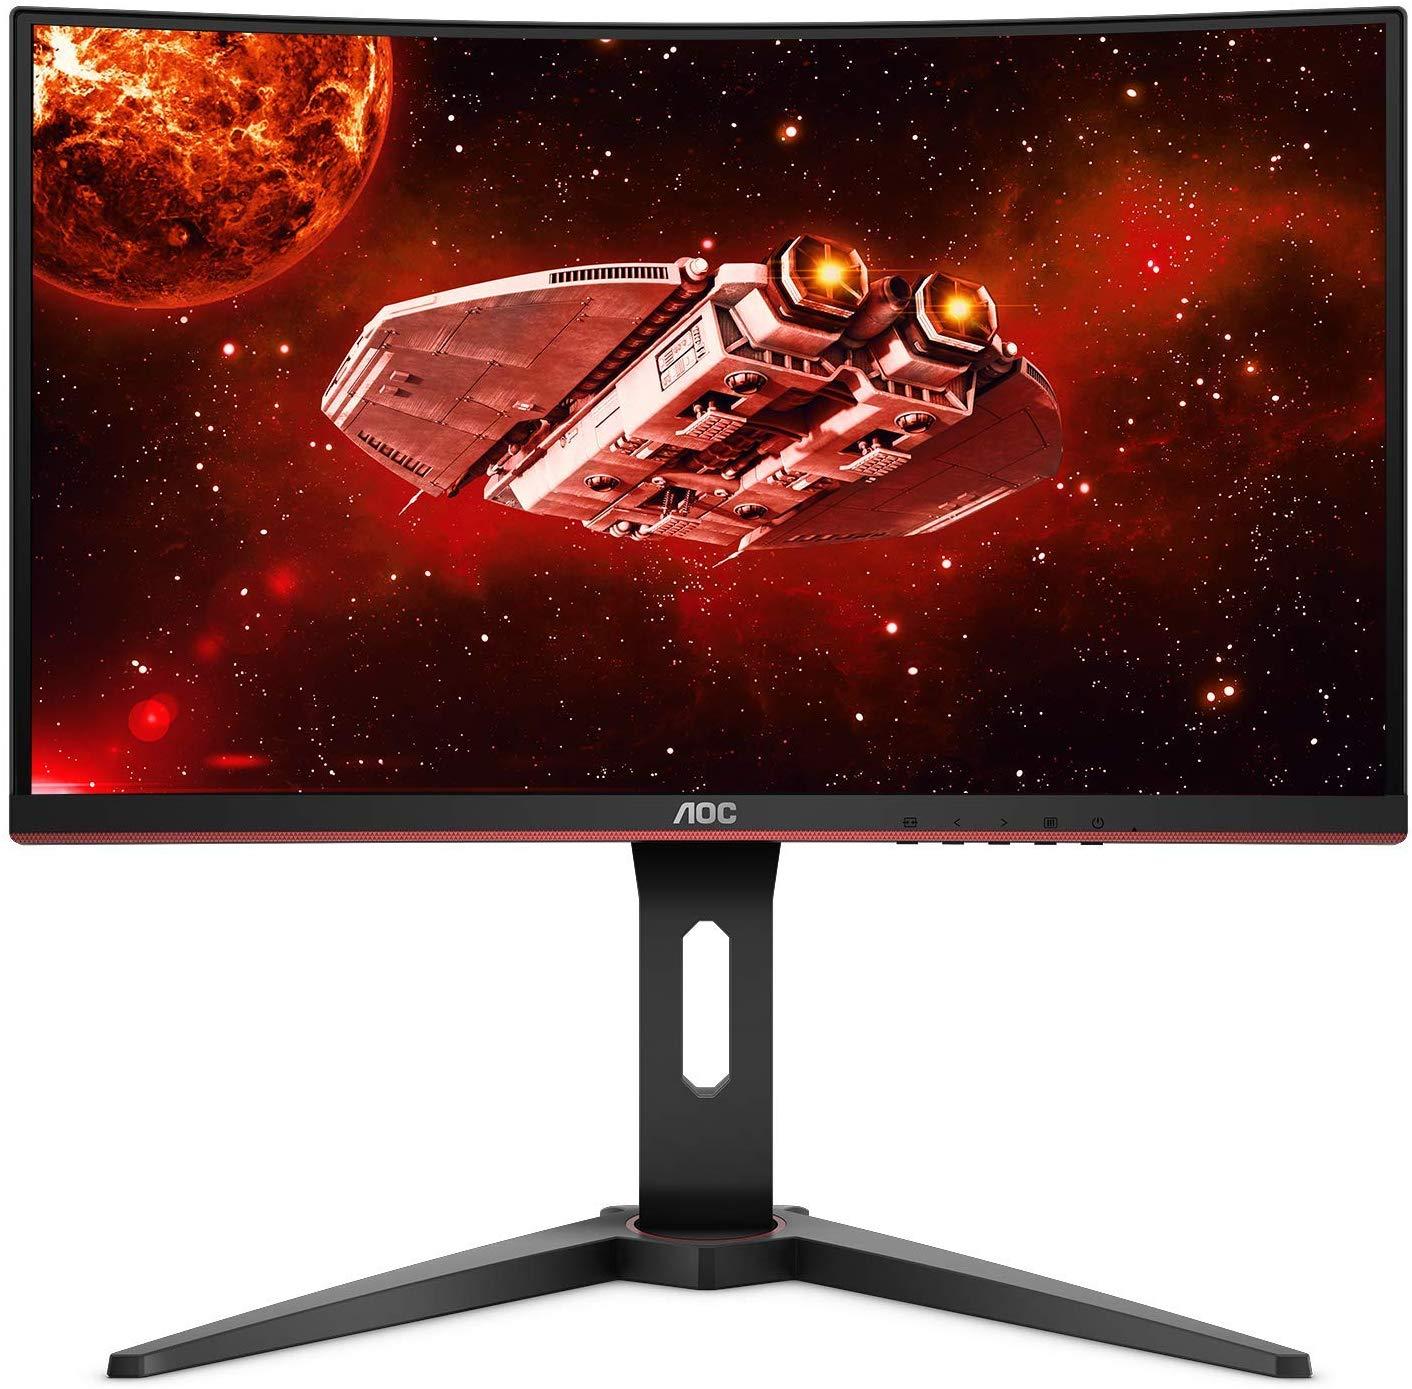 "AOC CQ27G1 27"" Curved Frameless Gaming Monitor QHD/2K, 1ms, 144Hz, FreeSync, DisplayPort/HDMI/VGA, Height adjustable, 3-Year Zero-Bright Dot $212.49"